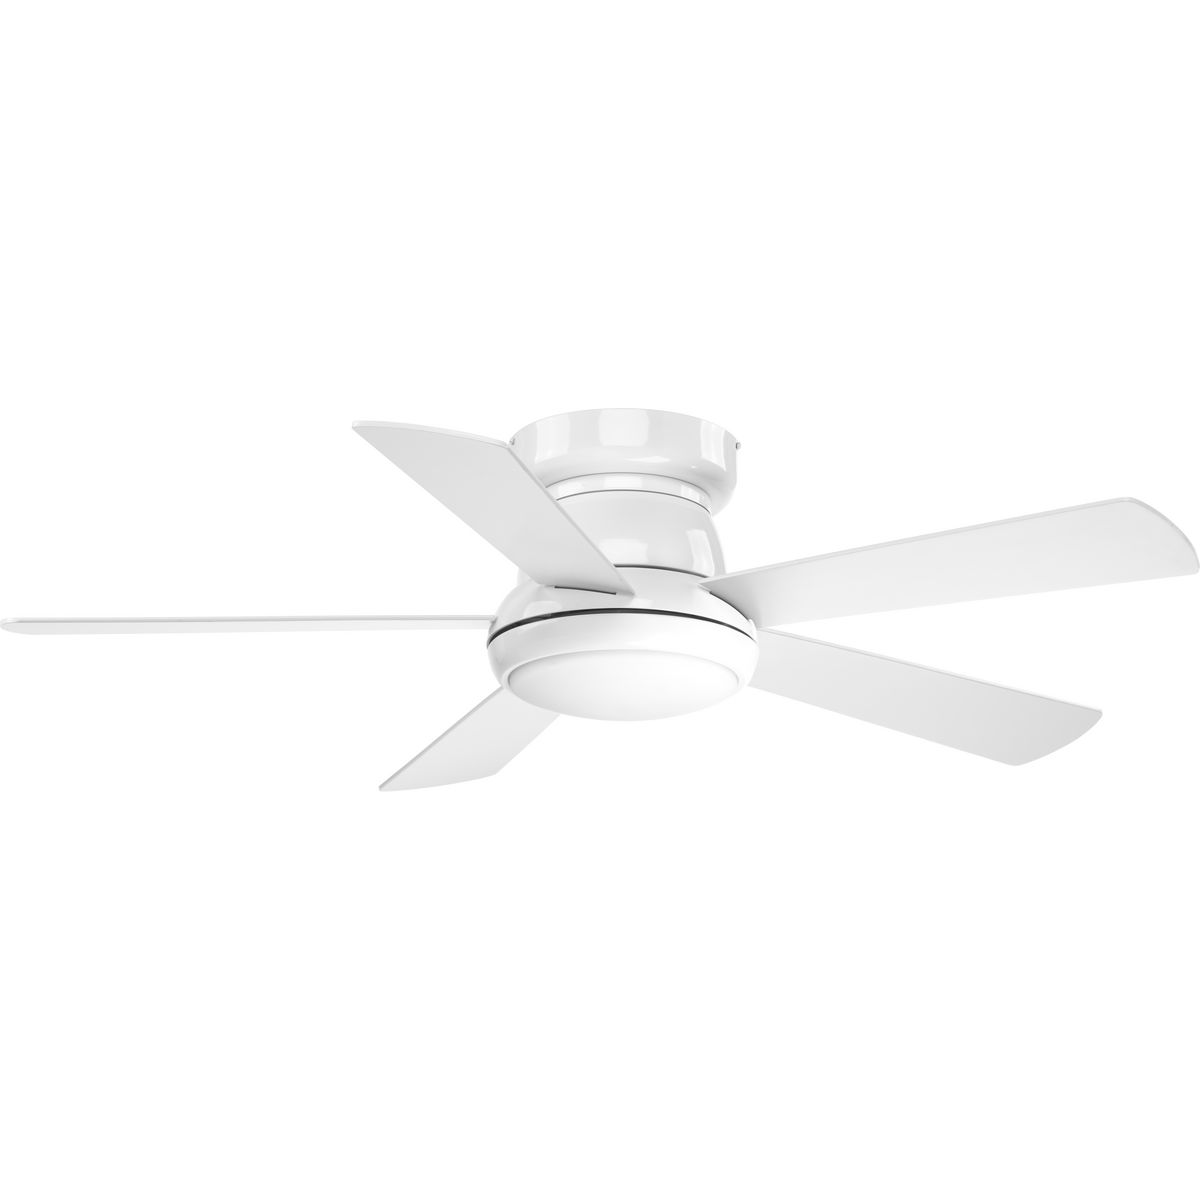 Vox 52 ceiling fan brand progress lighting progp25723030kprodimage aloadofball Choice Image